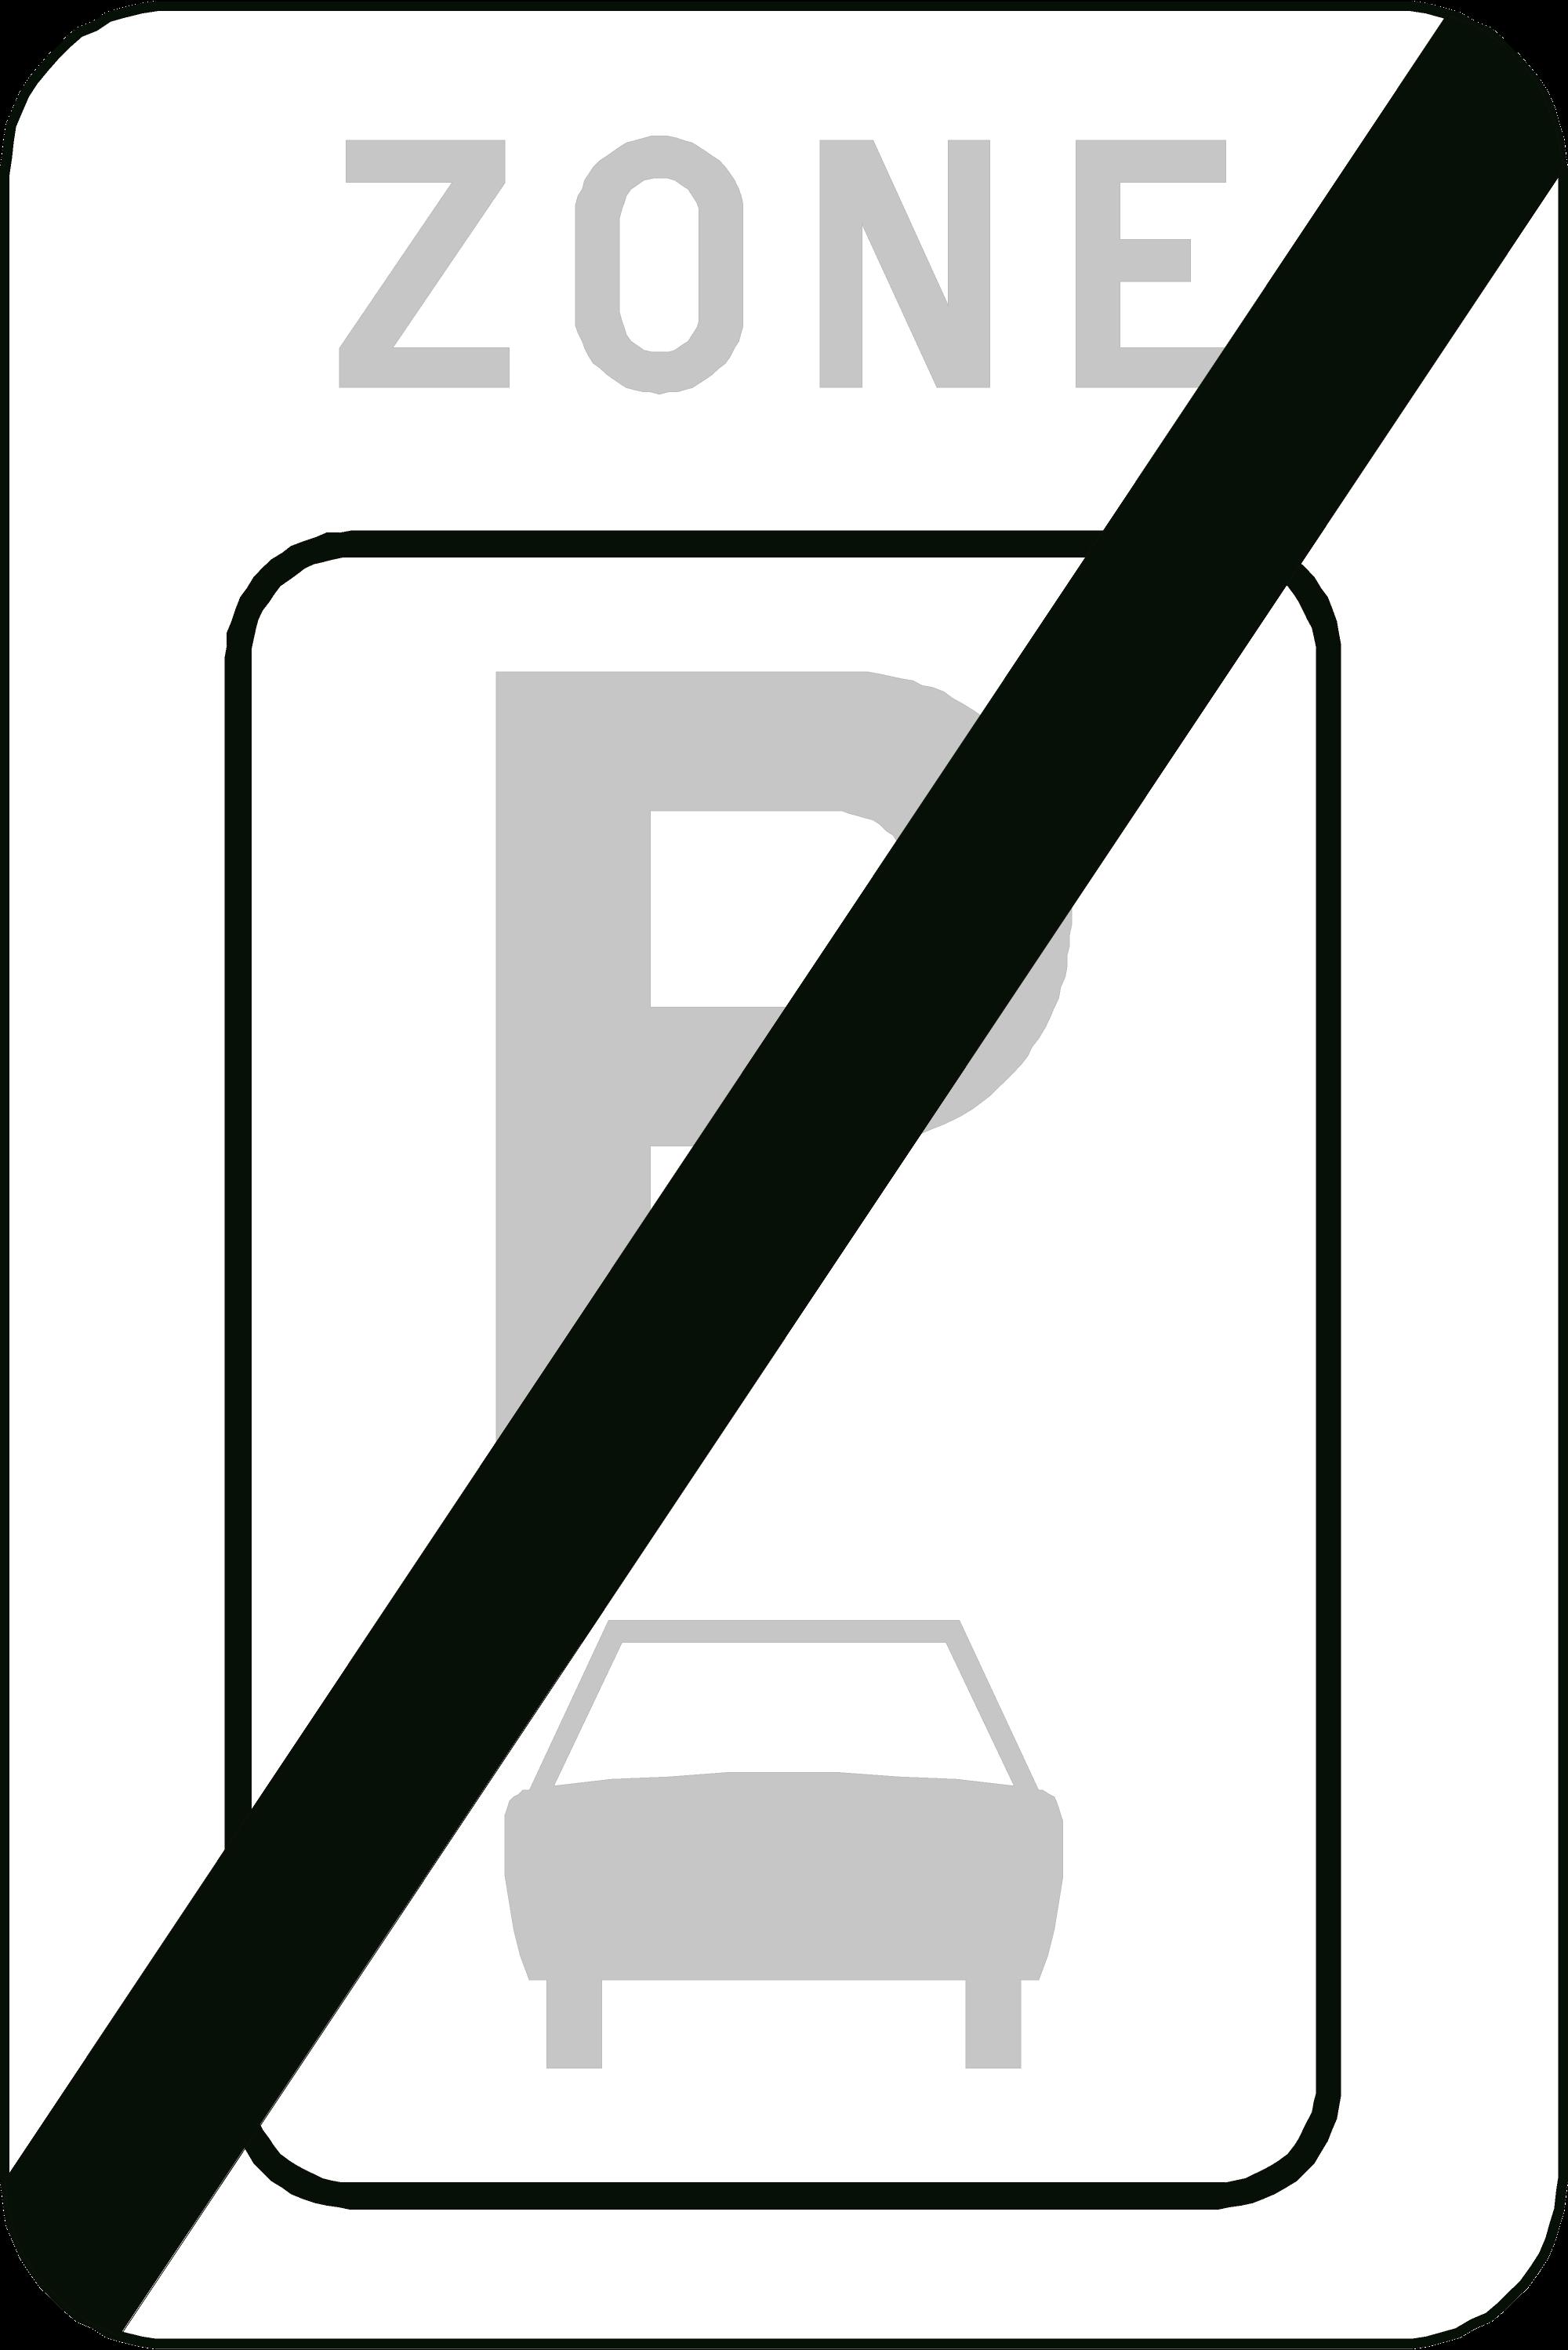 Signface - ZE9a/ - klasse  I - 400/600 mm